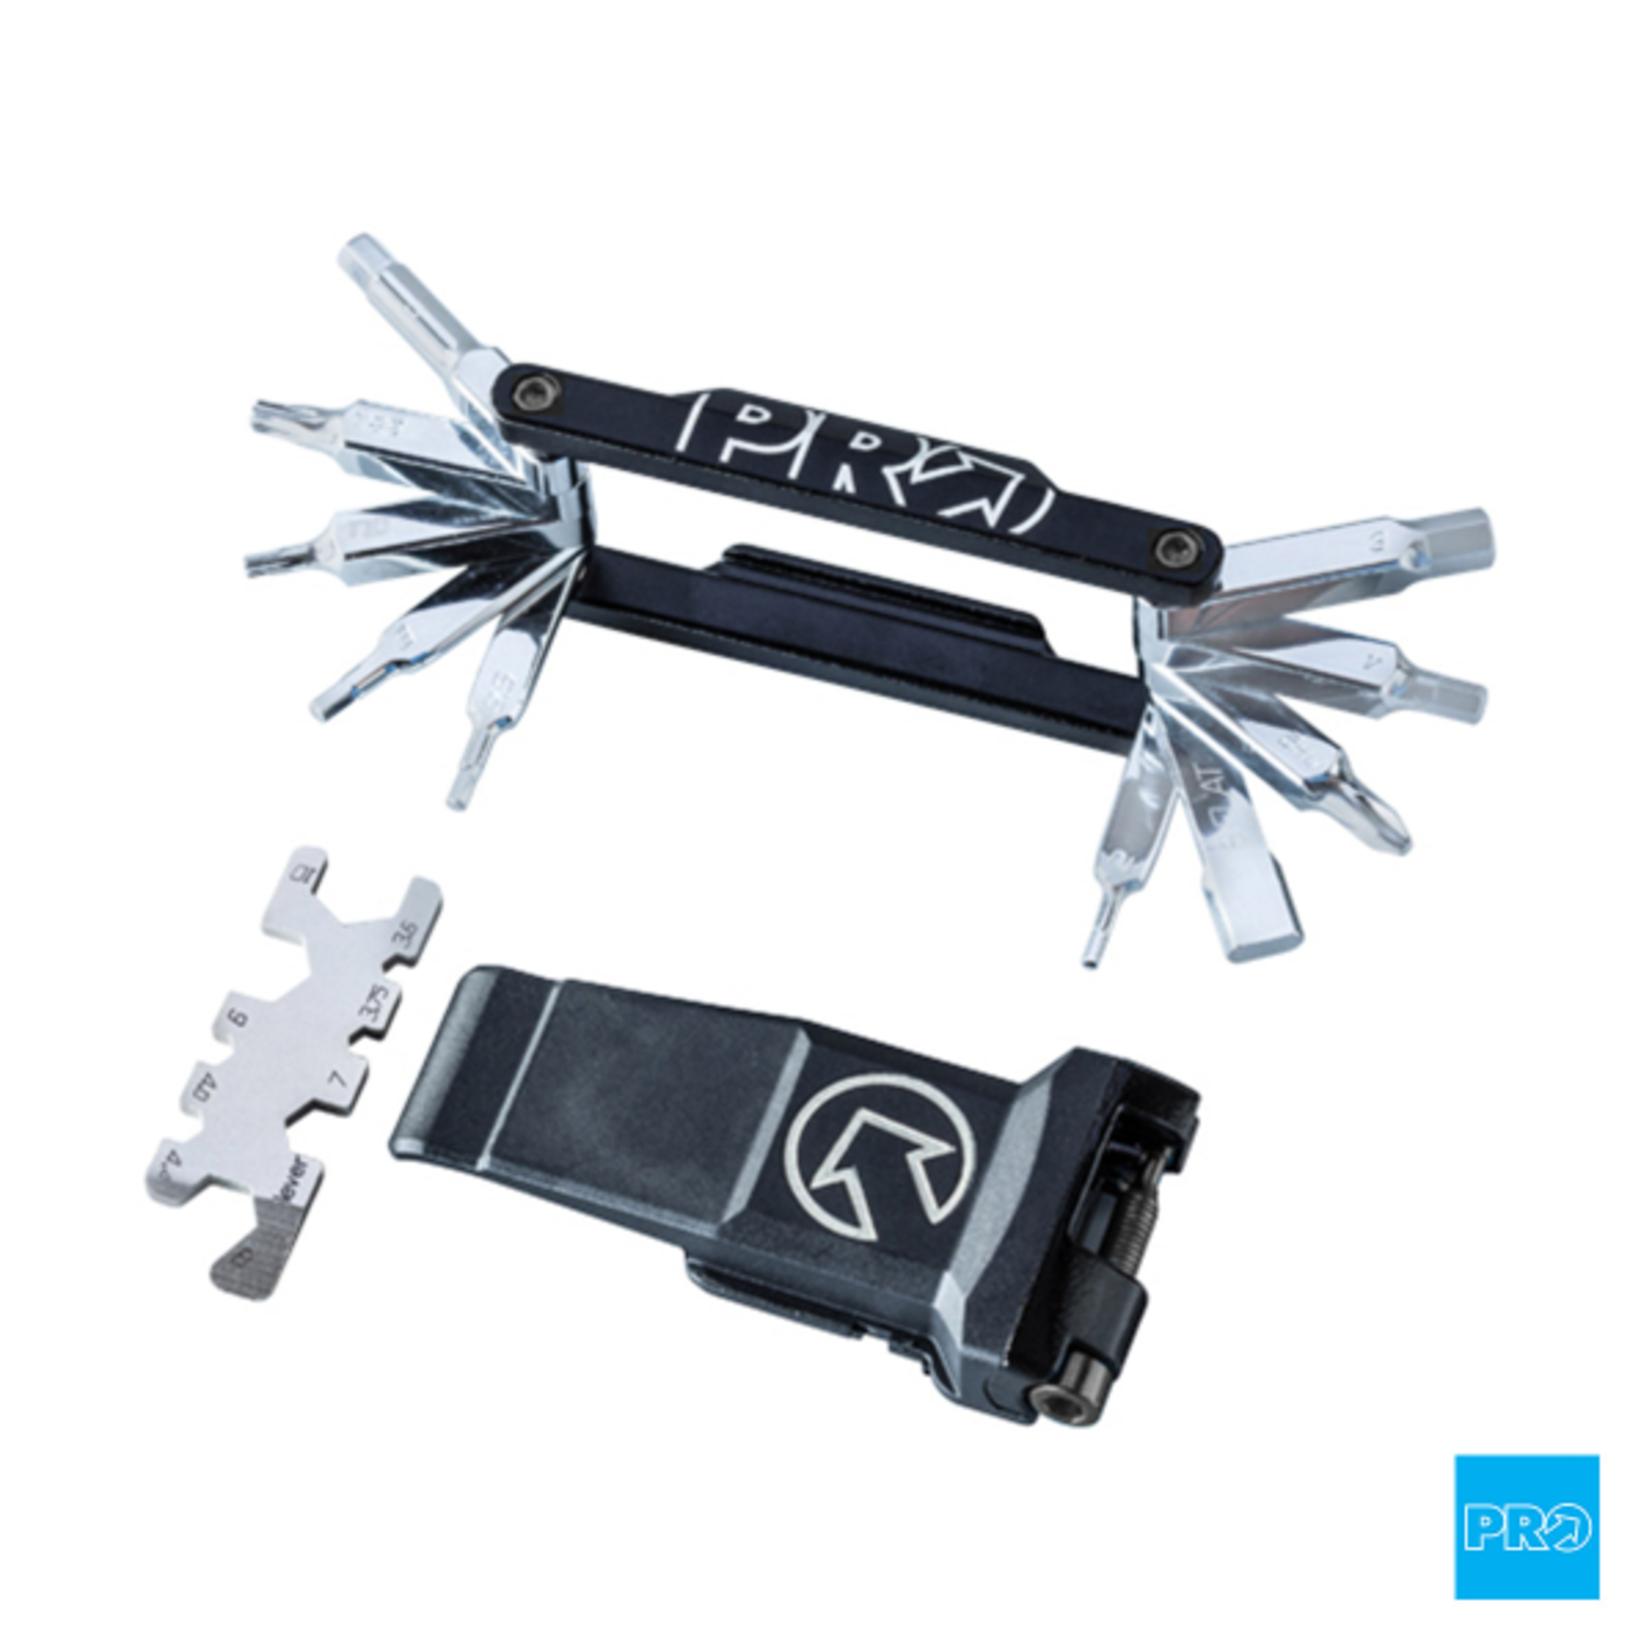 PRO PRO Mini Tool - 22 Functions